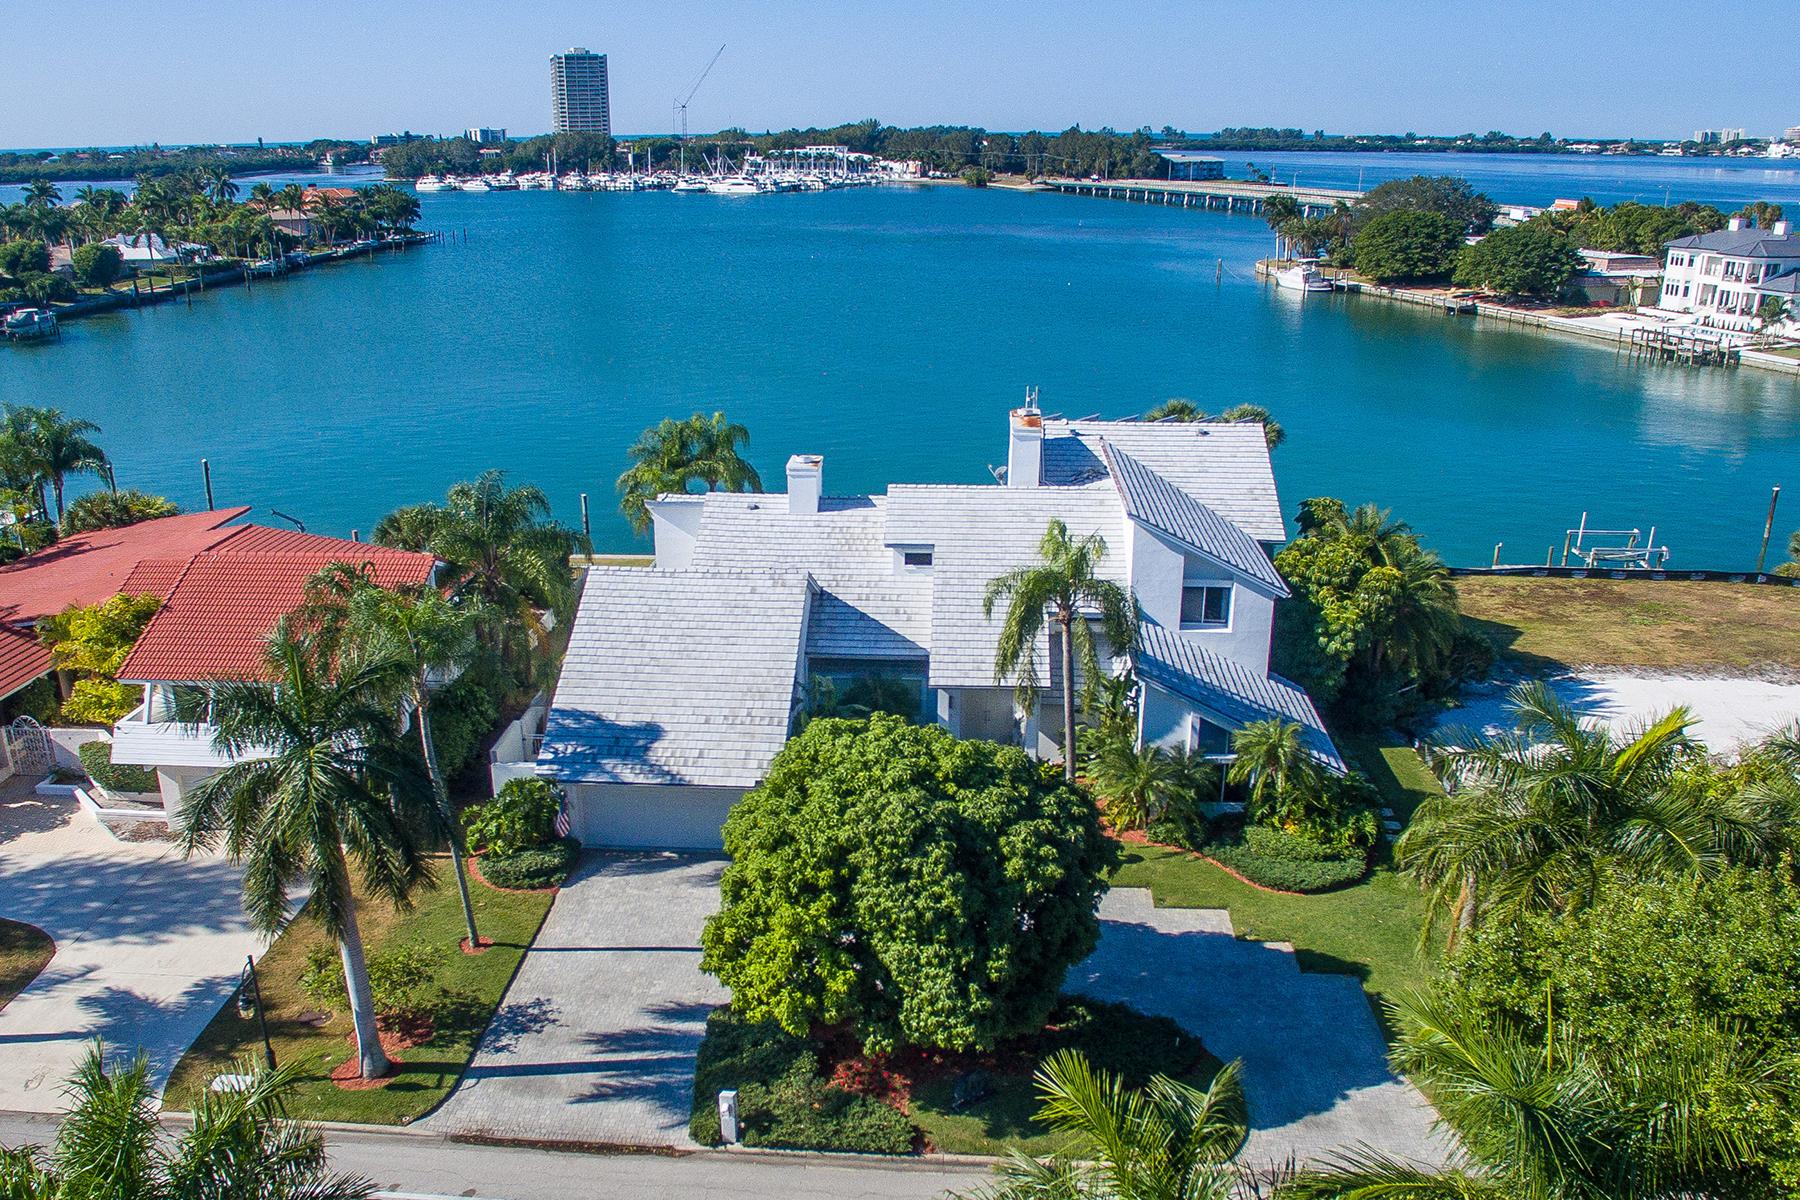 Single Family Home for Sale at BIRD KEY 216 Bird Key Dr Bird Key, Sarasota, Florida, 34236 United States